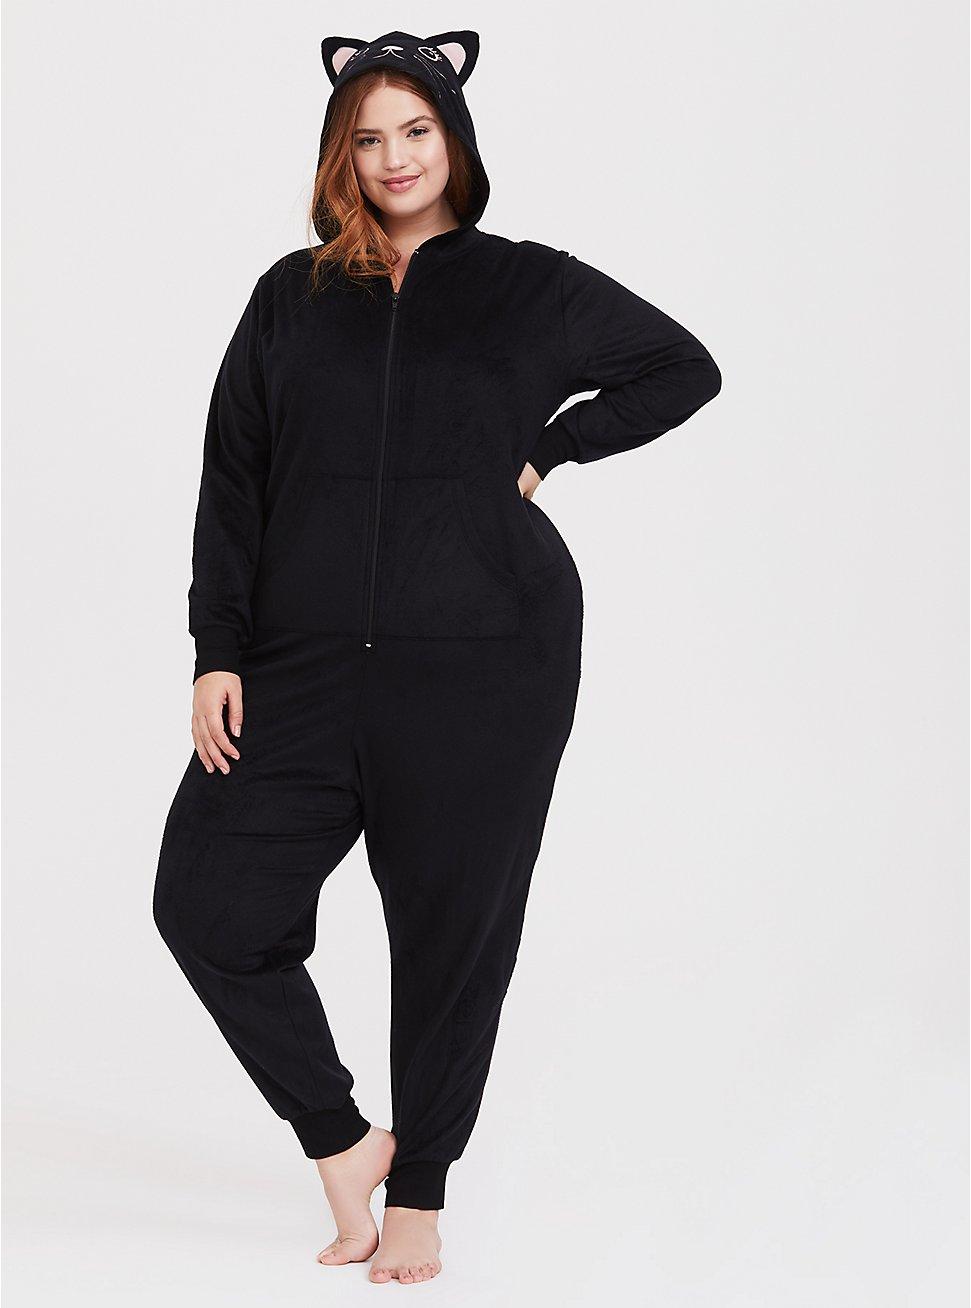 Plus Size Black Cat Fleece Onesie, DEEP BLACK, hi-res